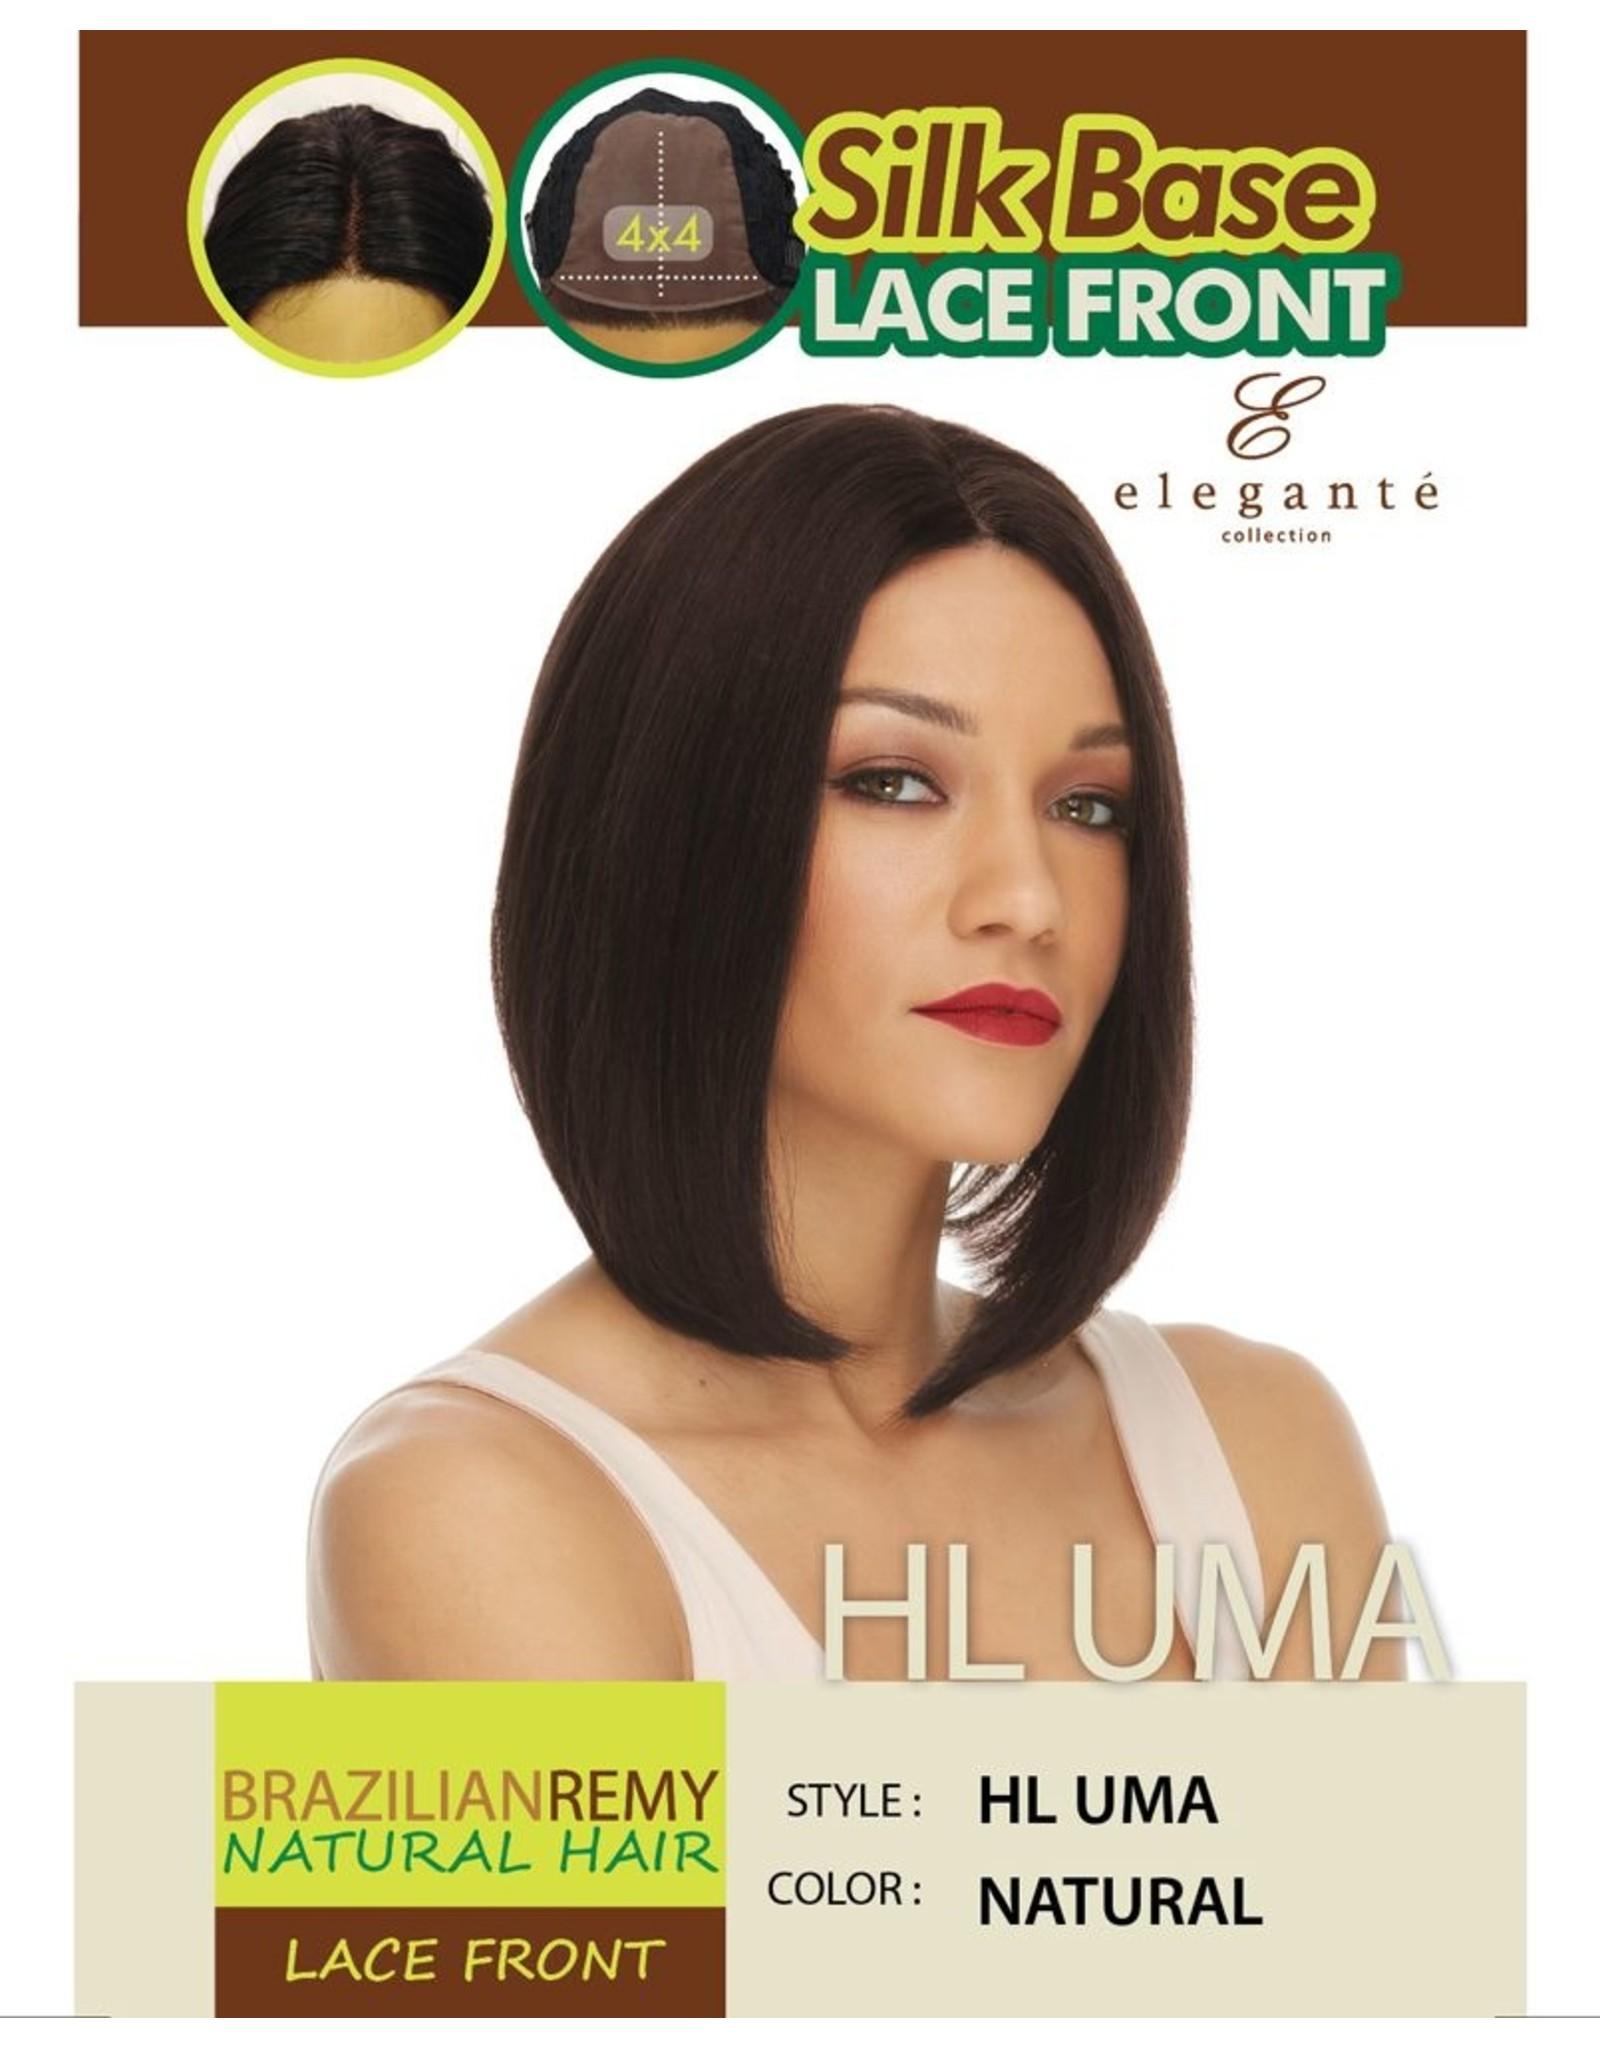 Elegante BRAZILIAN L/F HL UMA #NATURAL